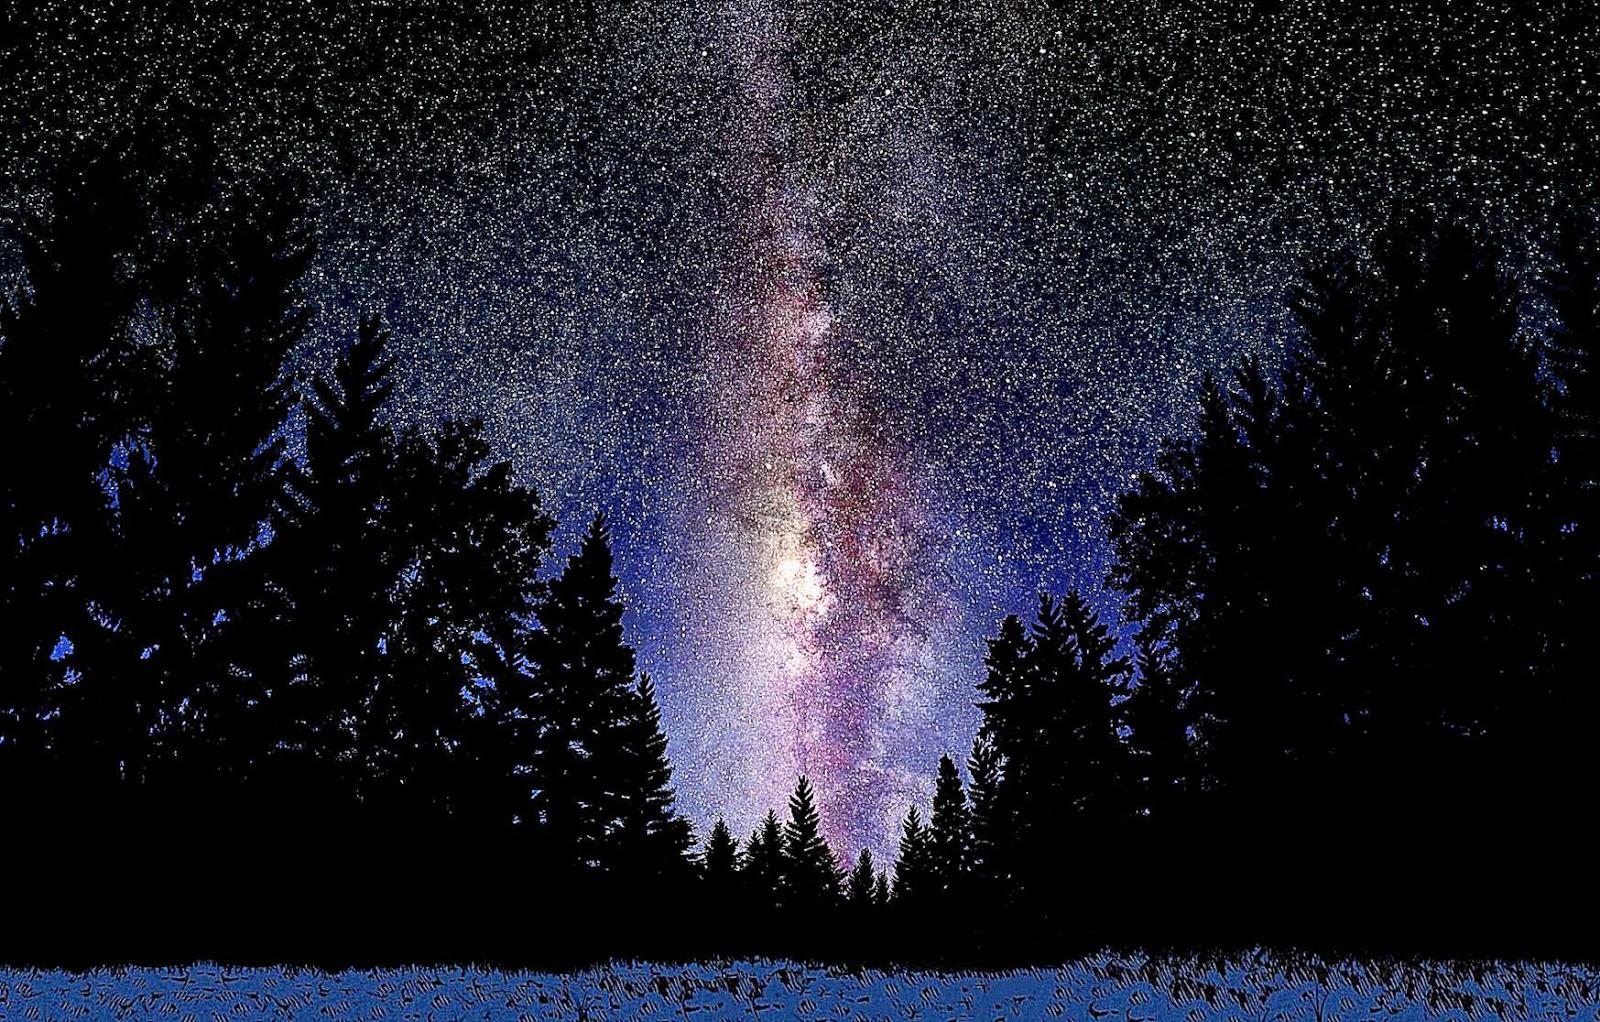 Milky way hd wallpaper cool hd wallpapers - Space night sky wallpaper ...